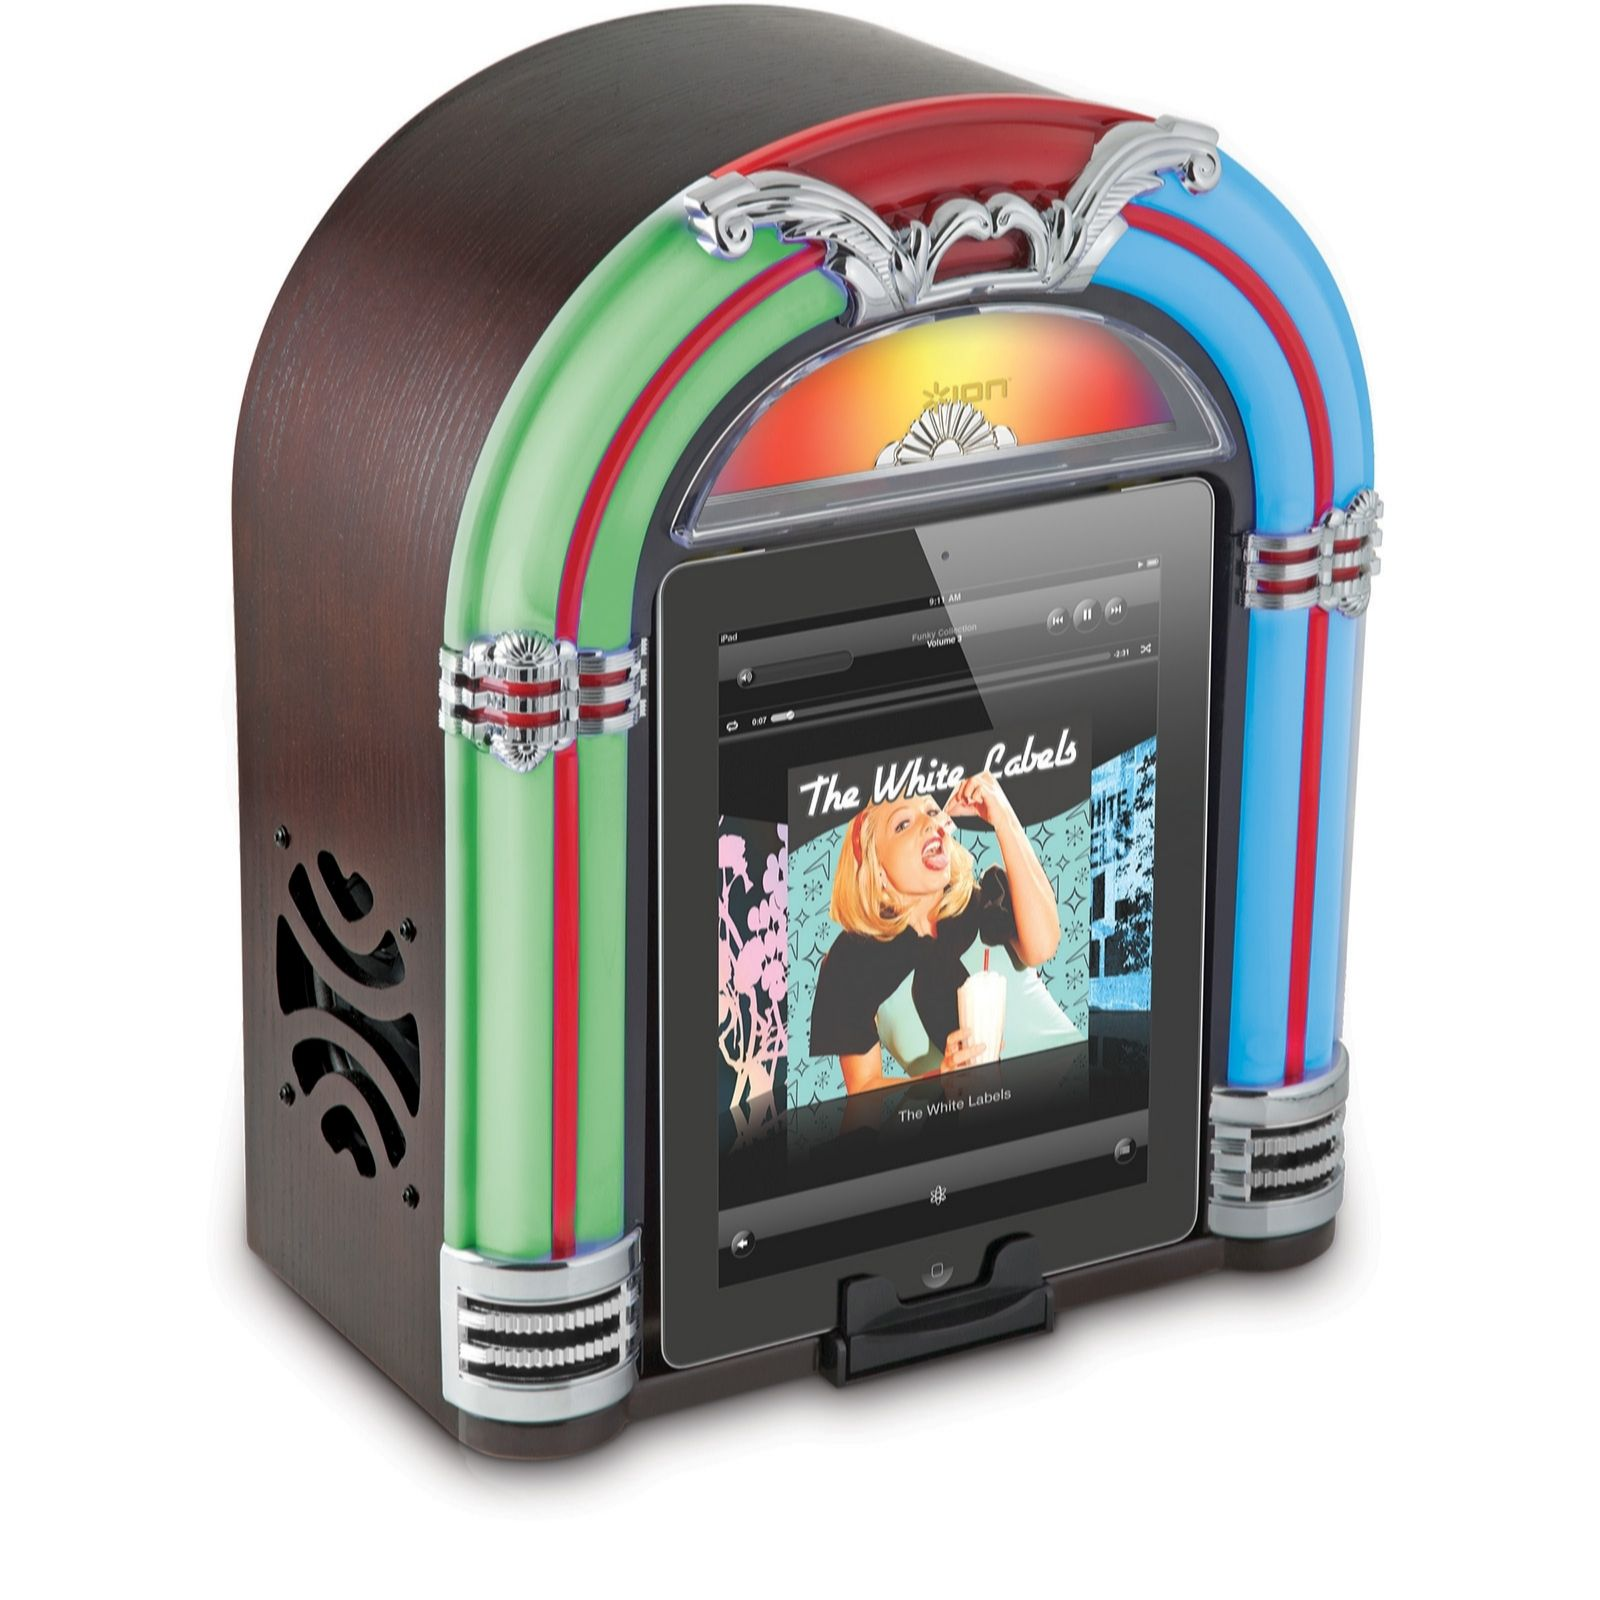 tv jukebox 3.5